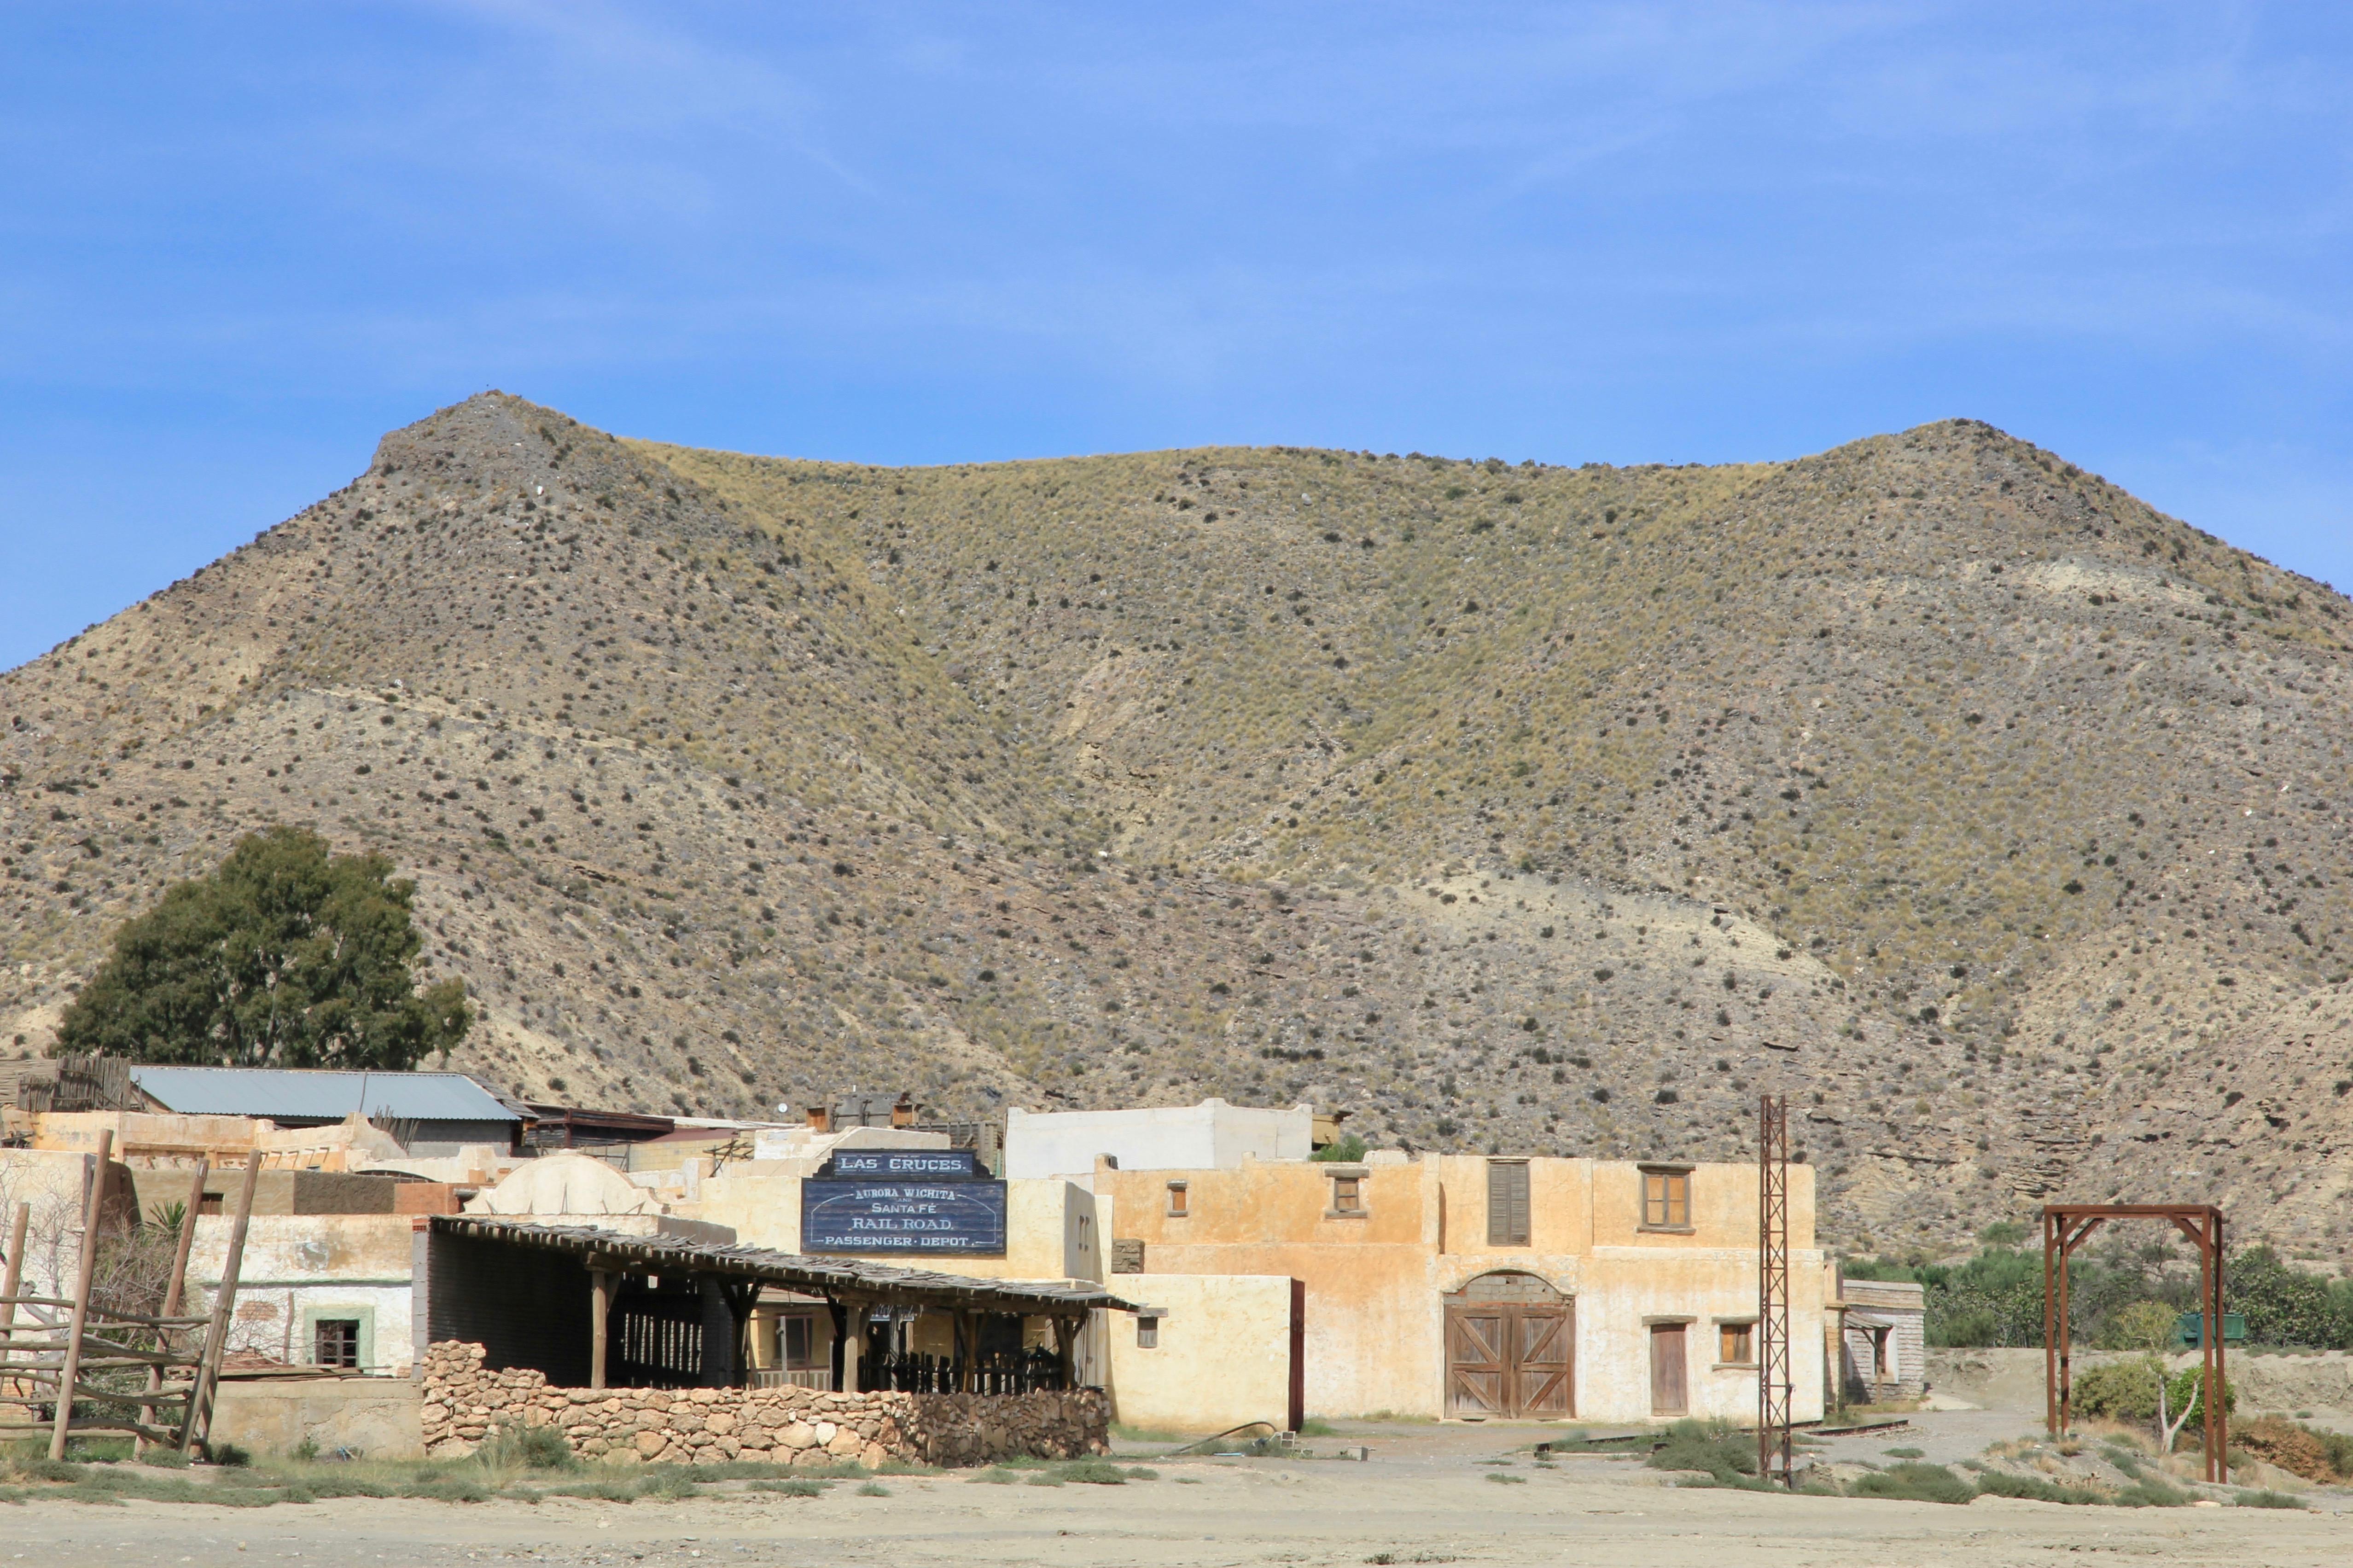 Visitare Fort Bravo